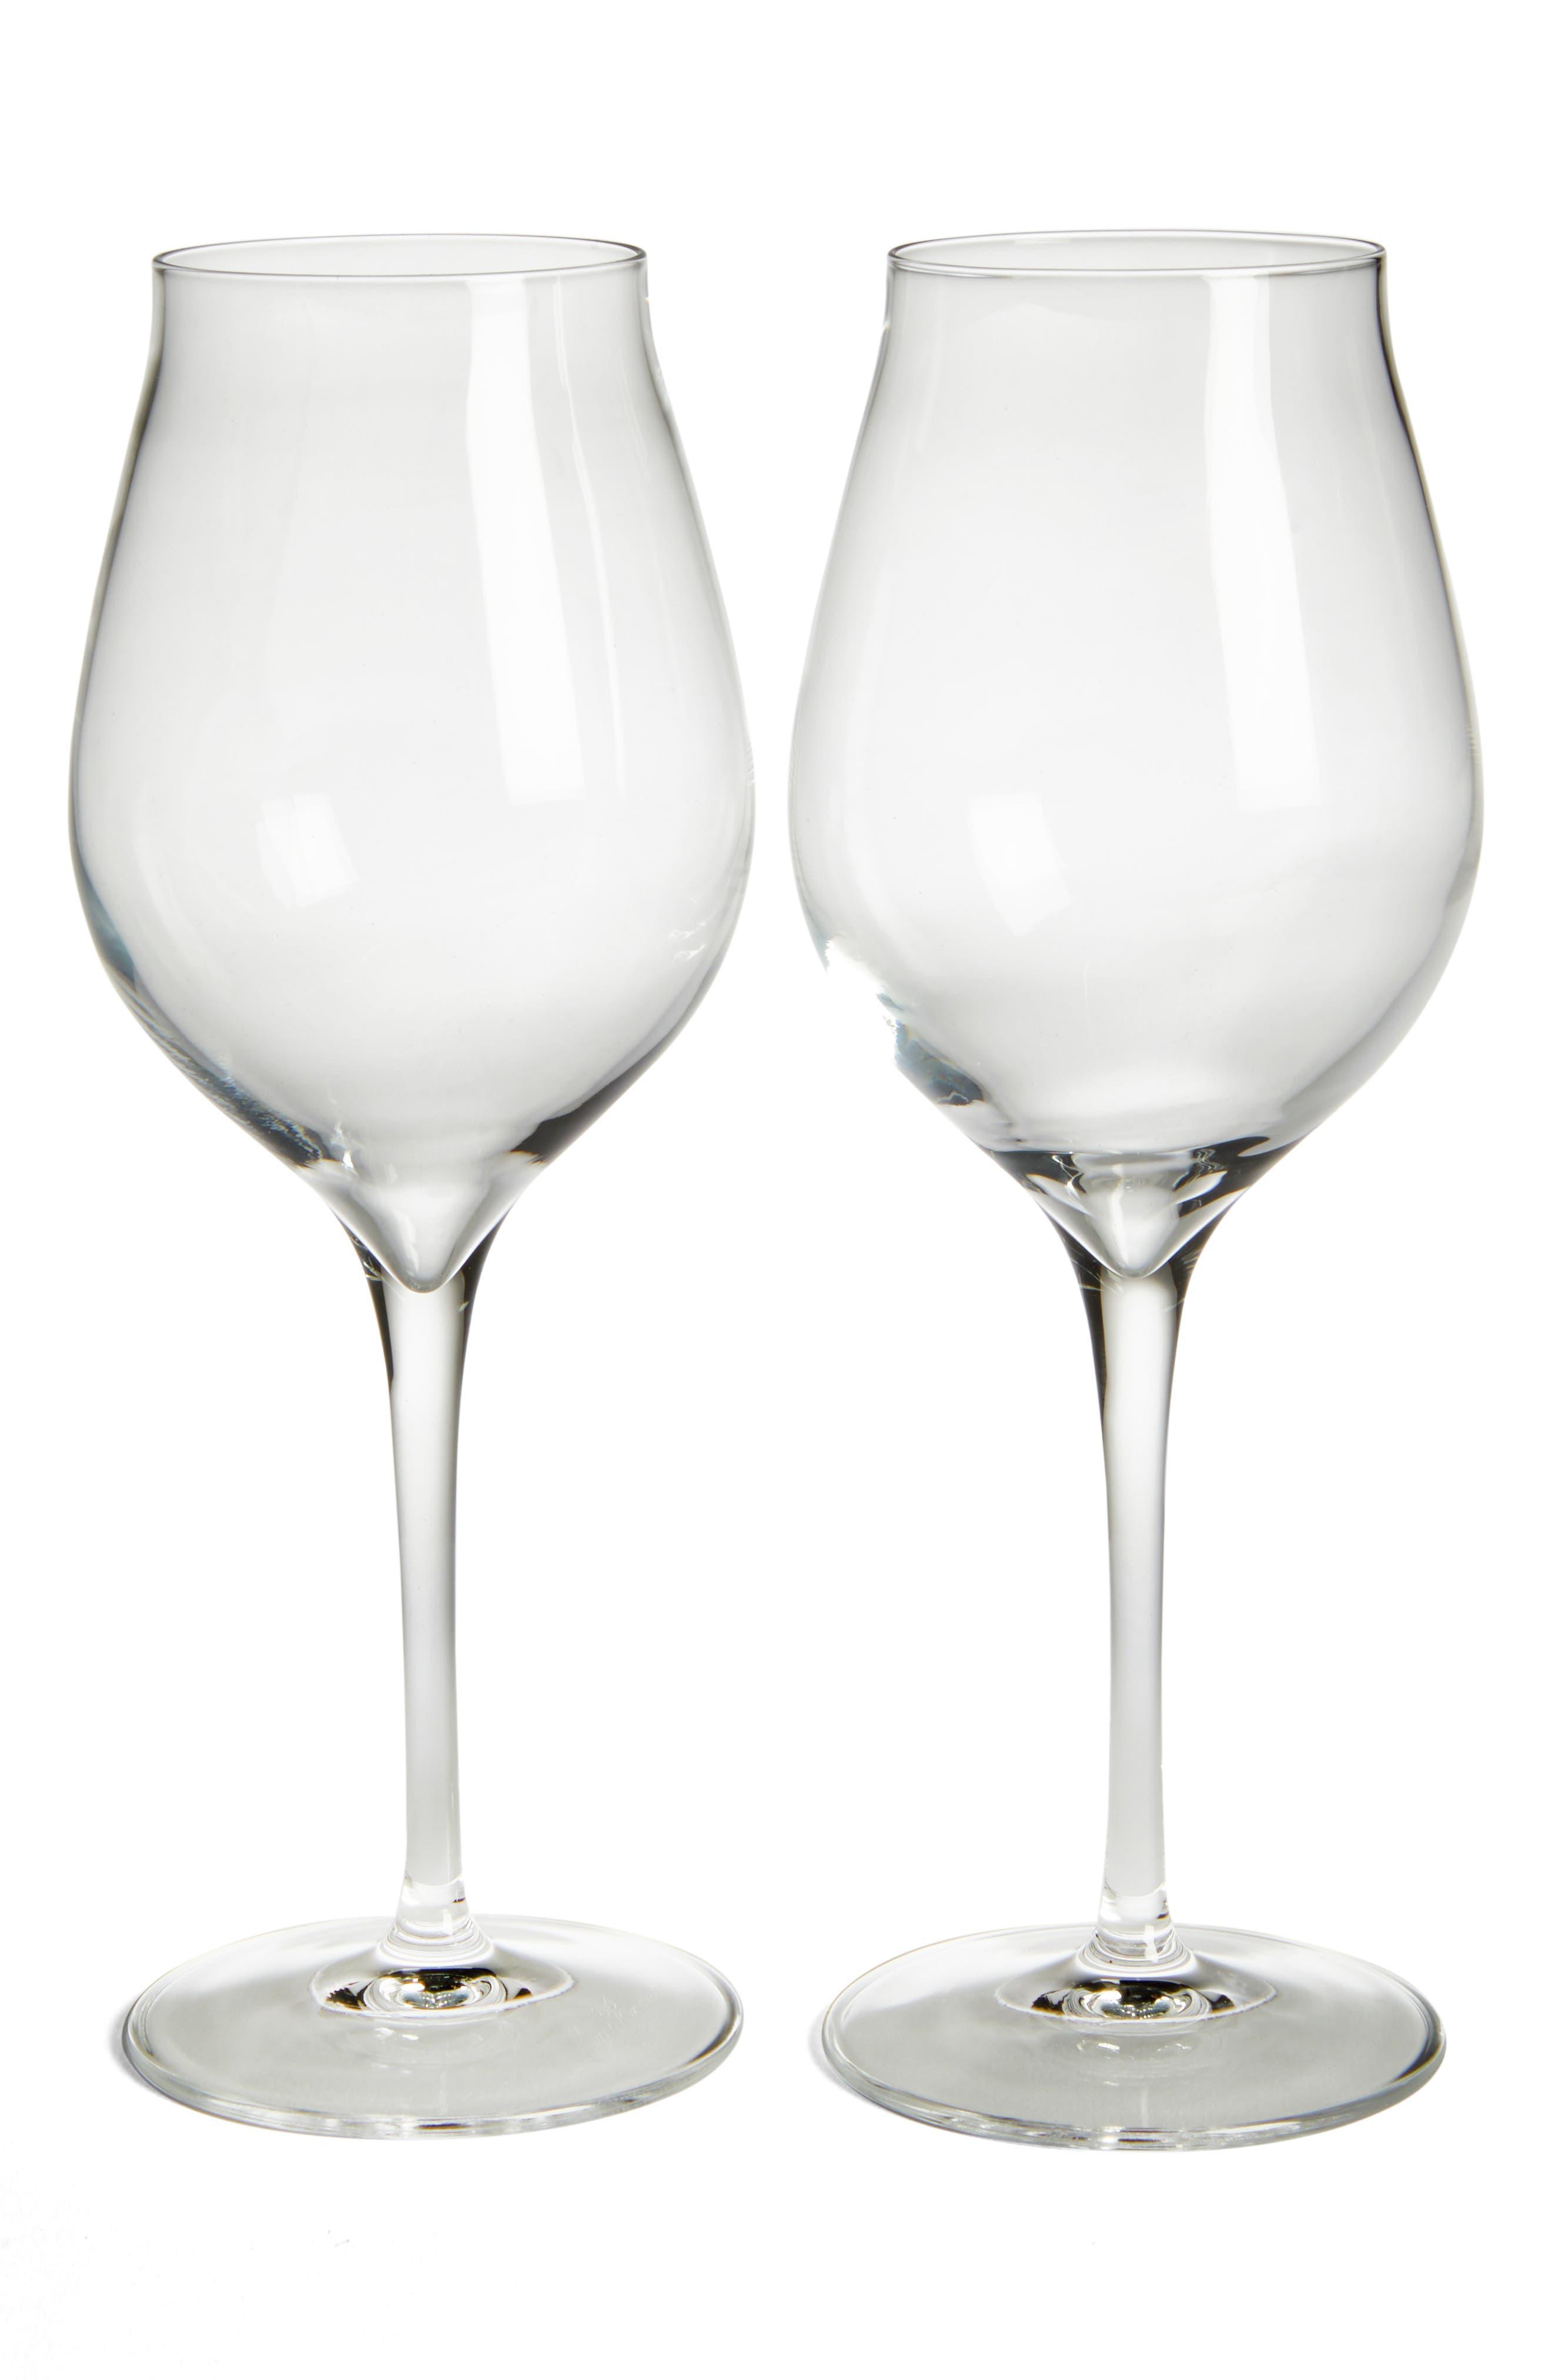 Luigi Bormiolo Vinea Malvasia/Orvieto Set of 2 White Wine Glasses,                         Main,                         color, Clear